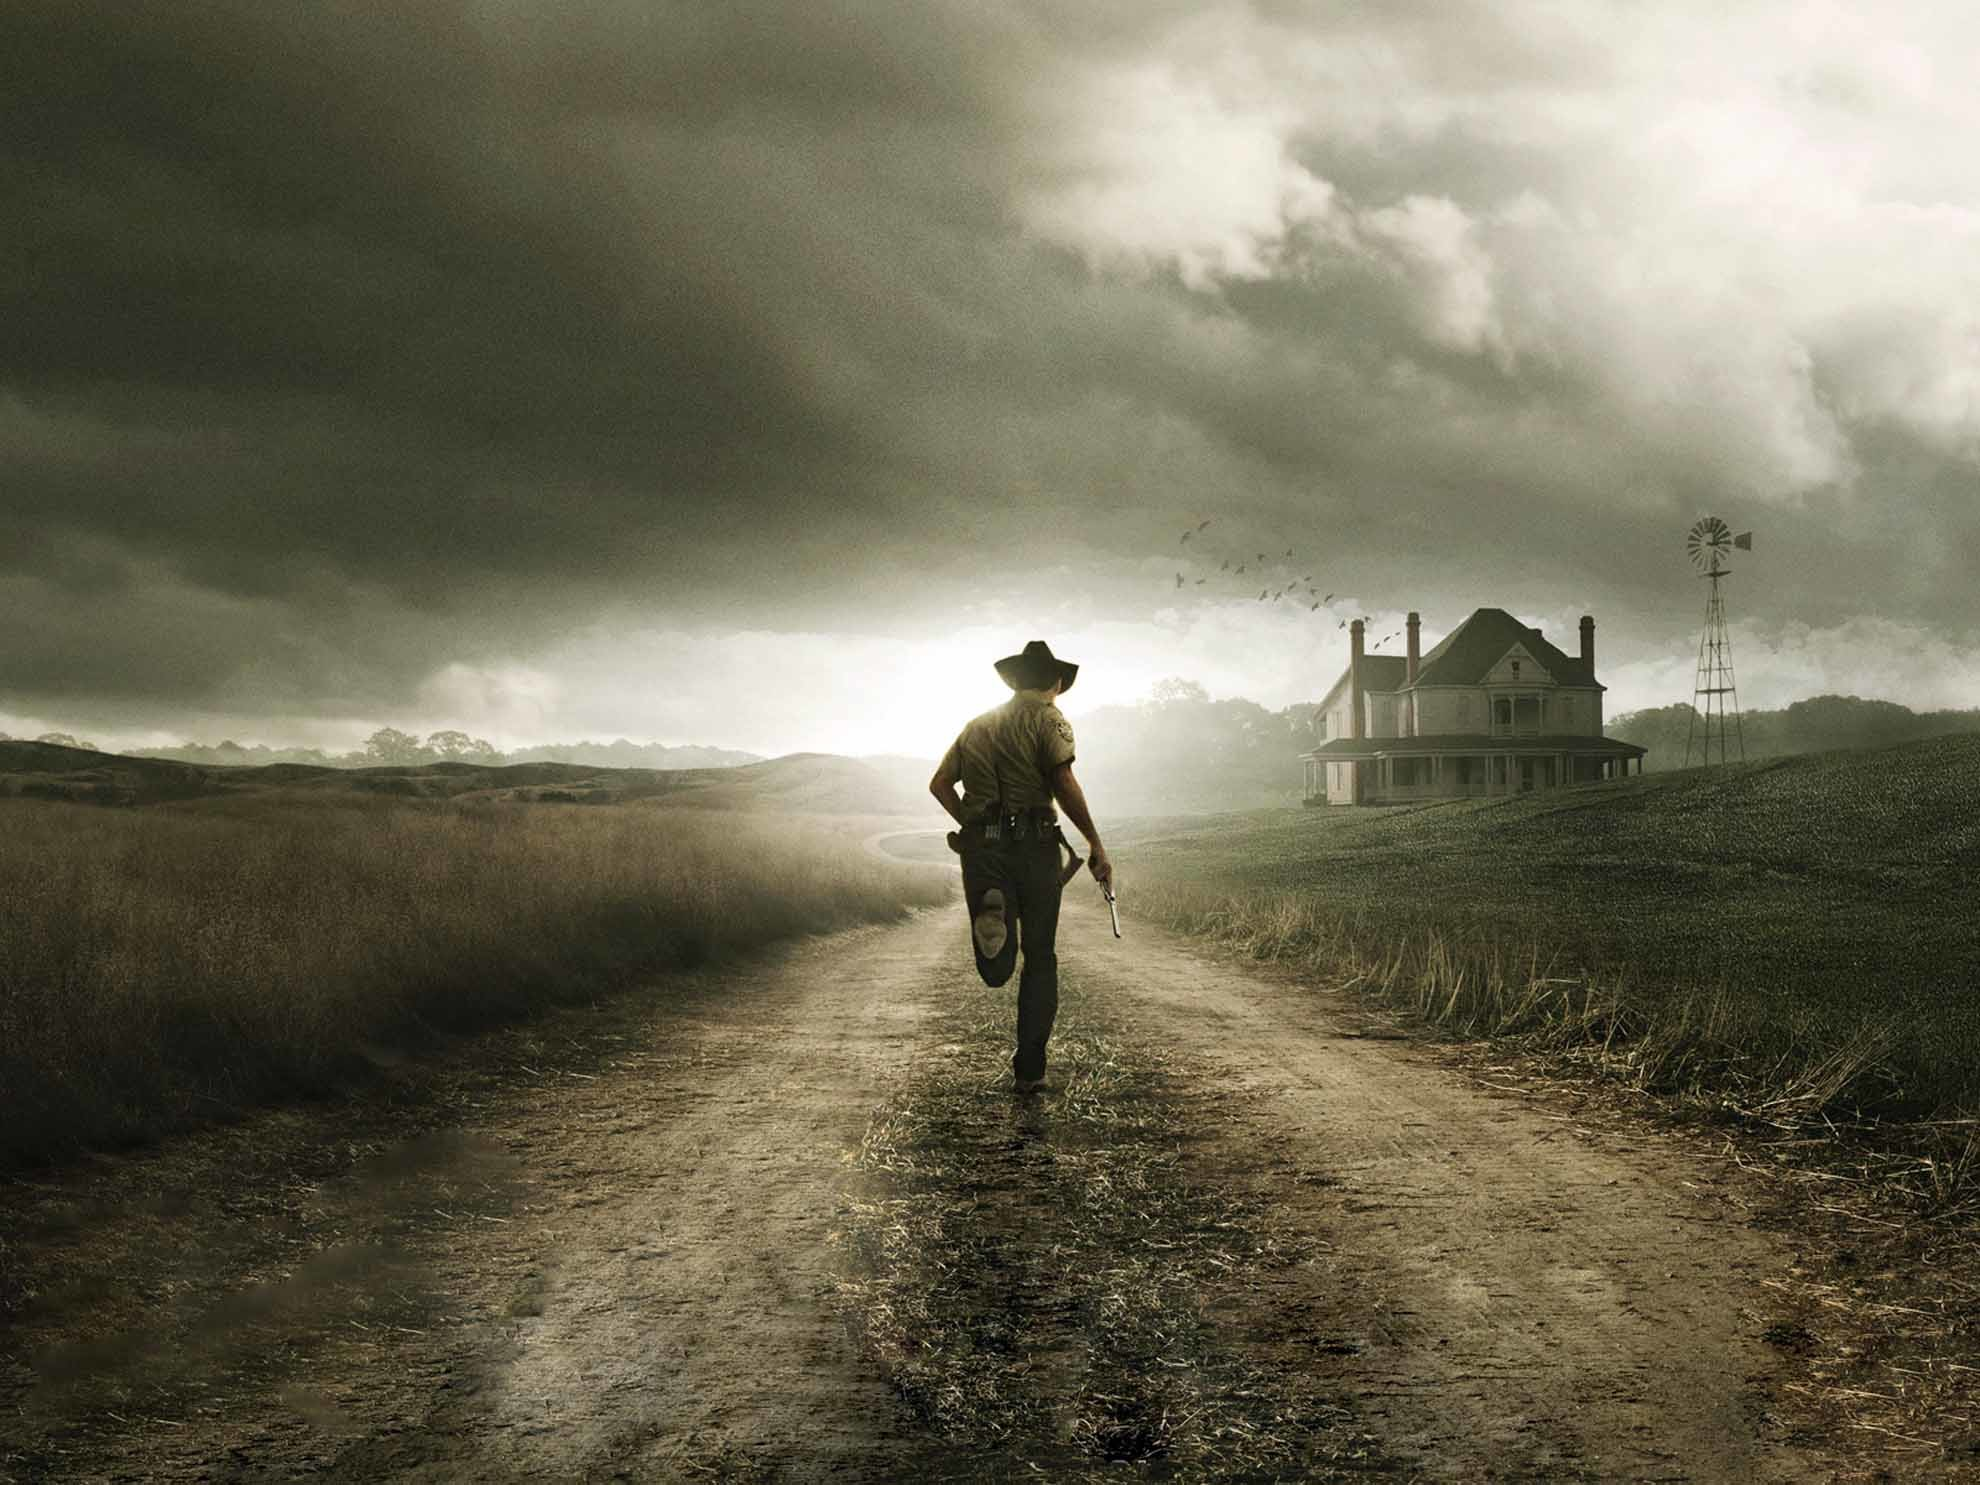 Walking Dead Wallpaper, iPhone Wallpaper, Facebook Cover, Twitter .